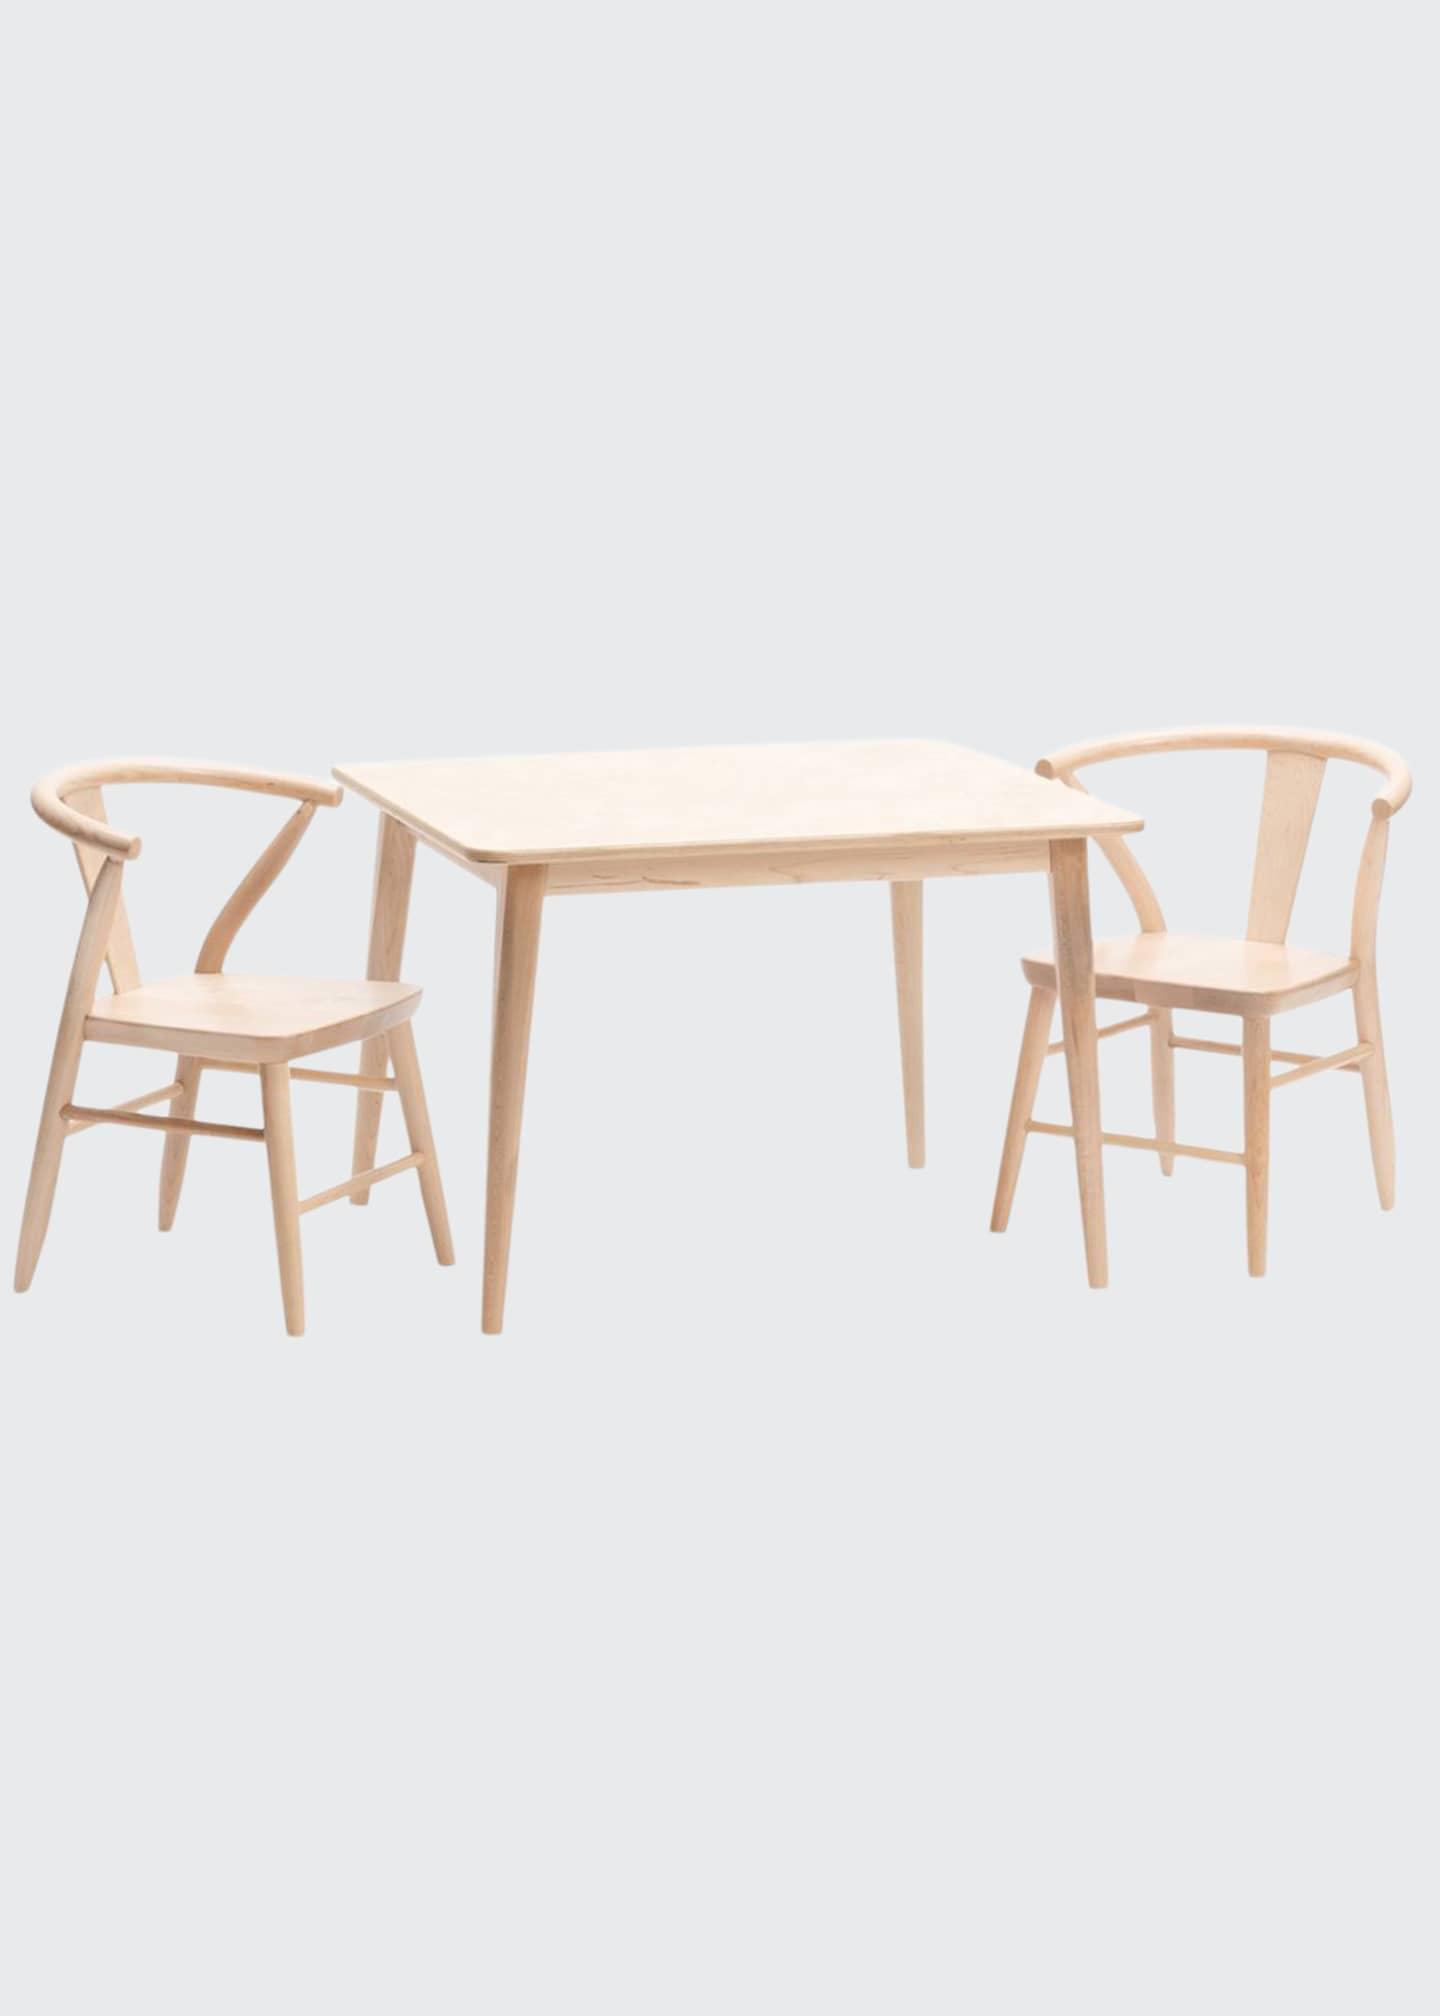 Milton & Goose Handmade Crescent Table & Chairs